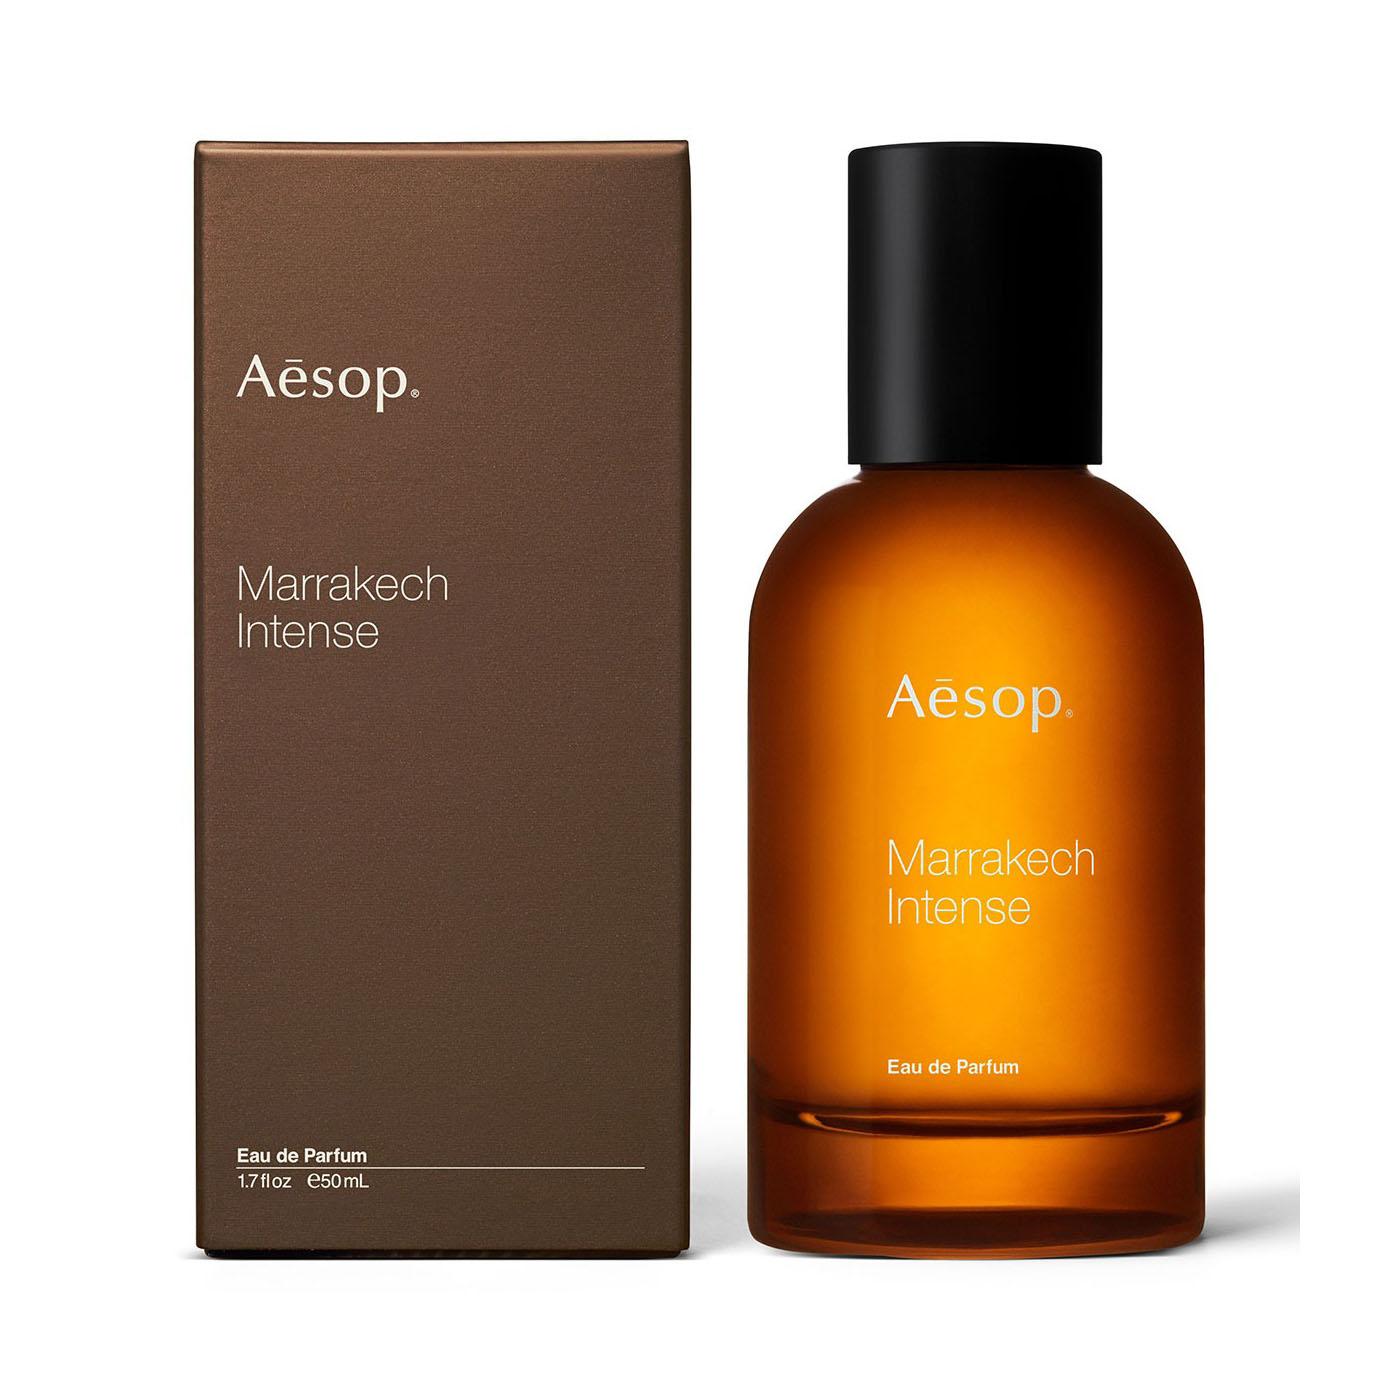 Aesop Marrakech Intense Eau de Parfum